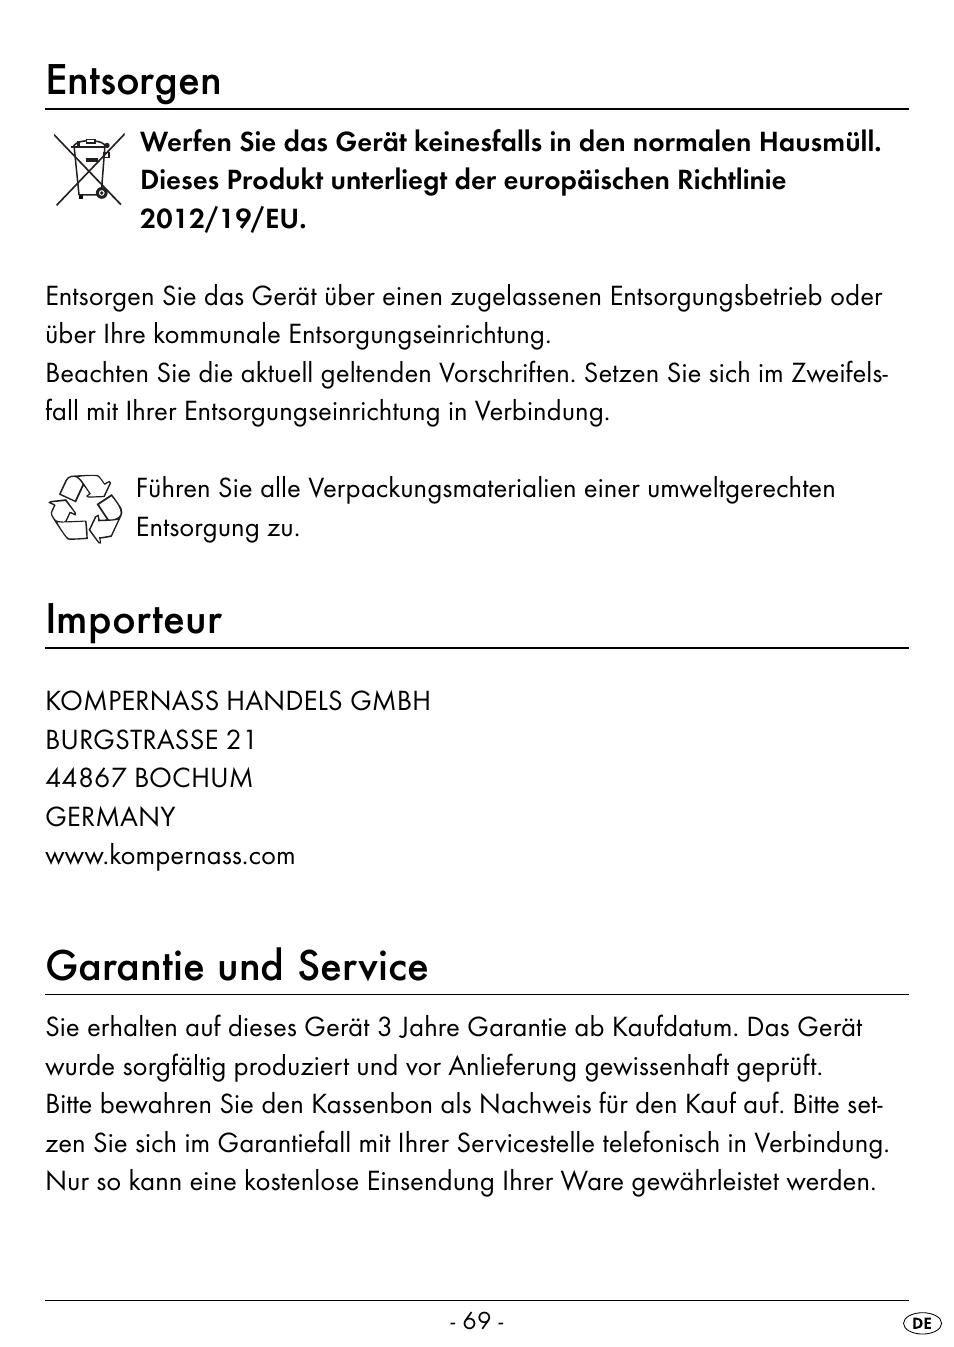 entsorgen importeur garantie und service silvercrest seas 20 a1 rh manualsdir com sears user manuals Manuals in PDF